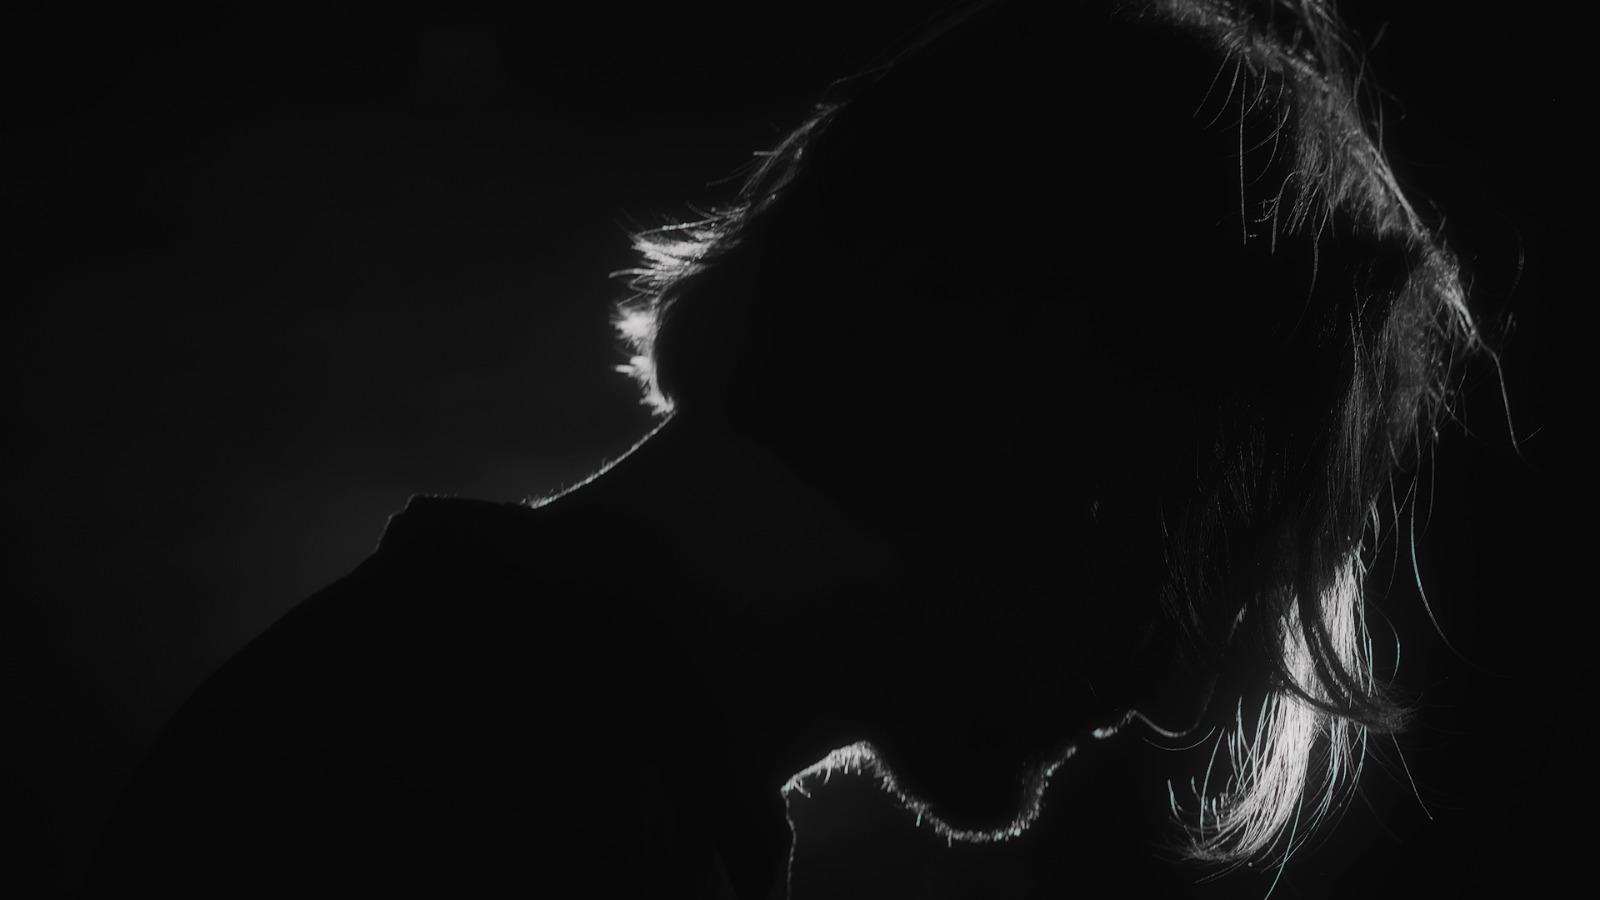 Franek Windy - Simone Franzolini